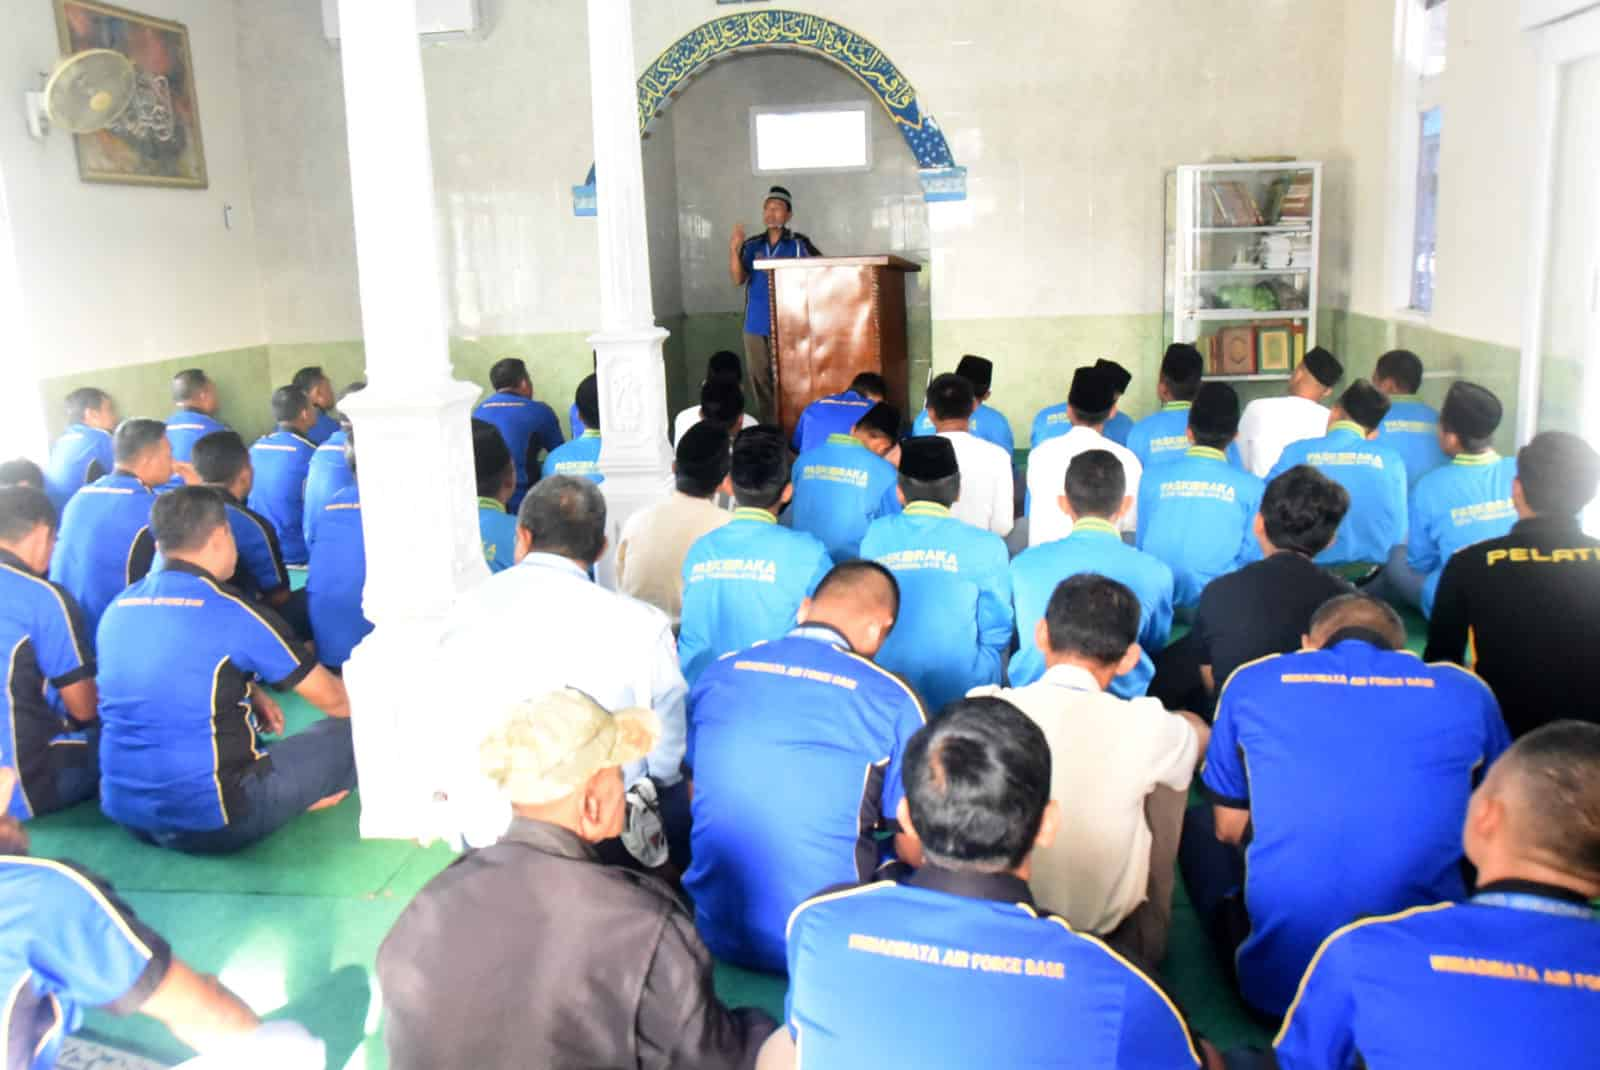 Lanud Wiriadinata Gelar Shalat Dhuha, Shalat Ghaib, Do'a Bersama Dan Tali Asih